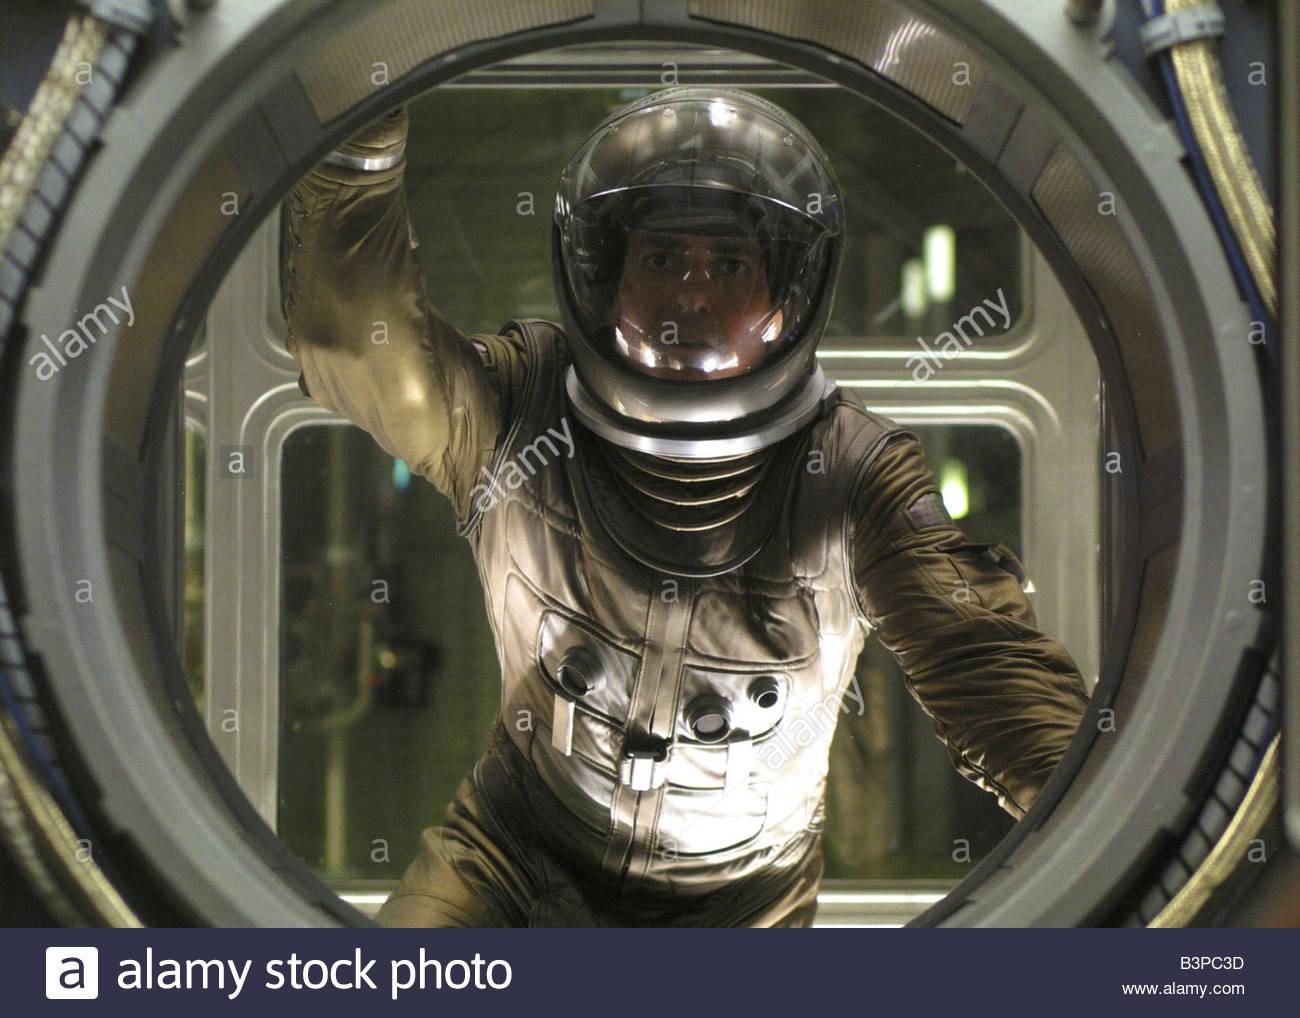 SOLARIS 2002 TCF film with George Clooney Stock Photo 19546785 1300x1018